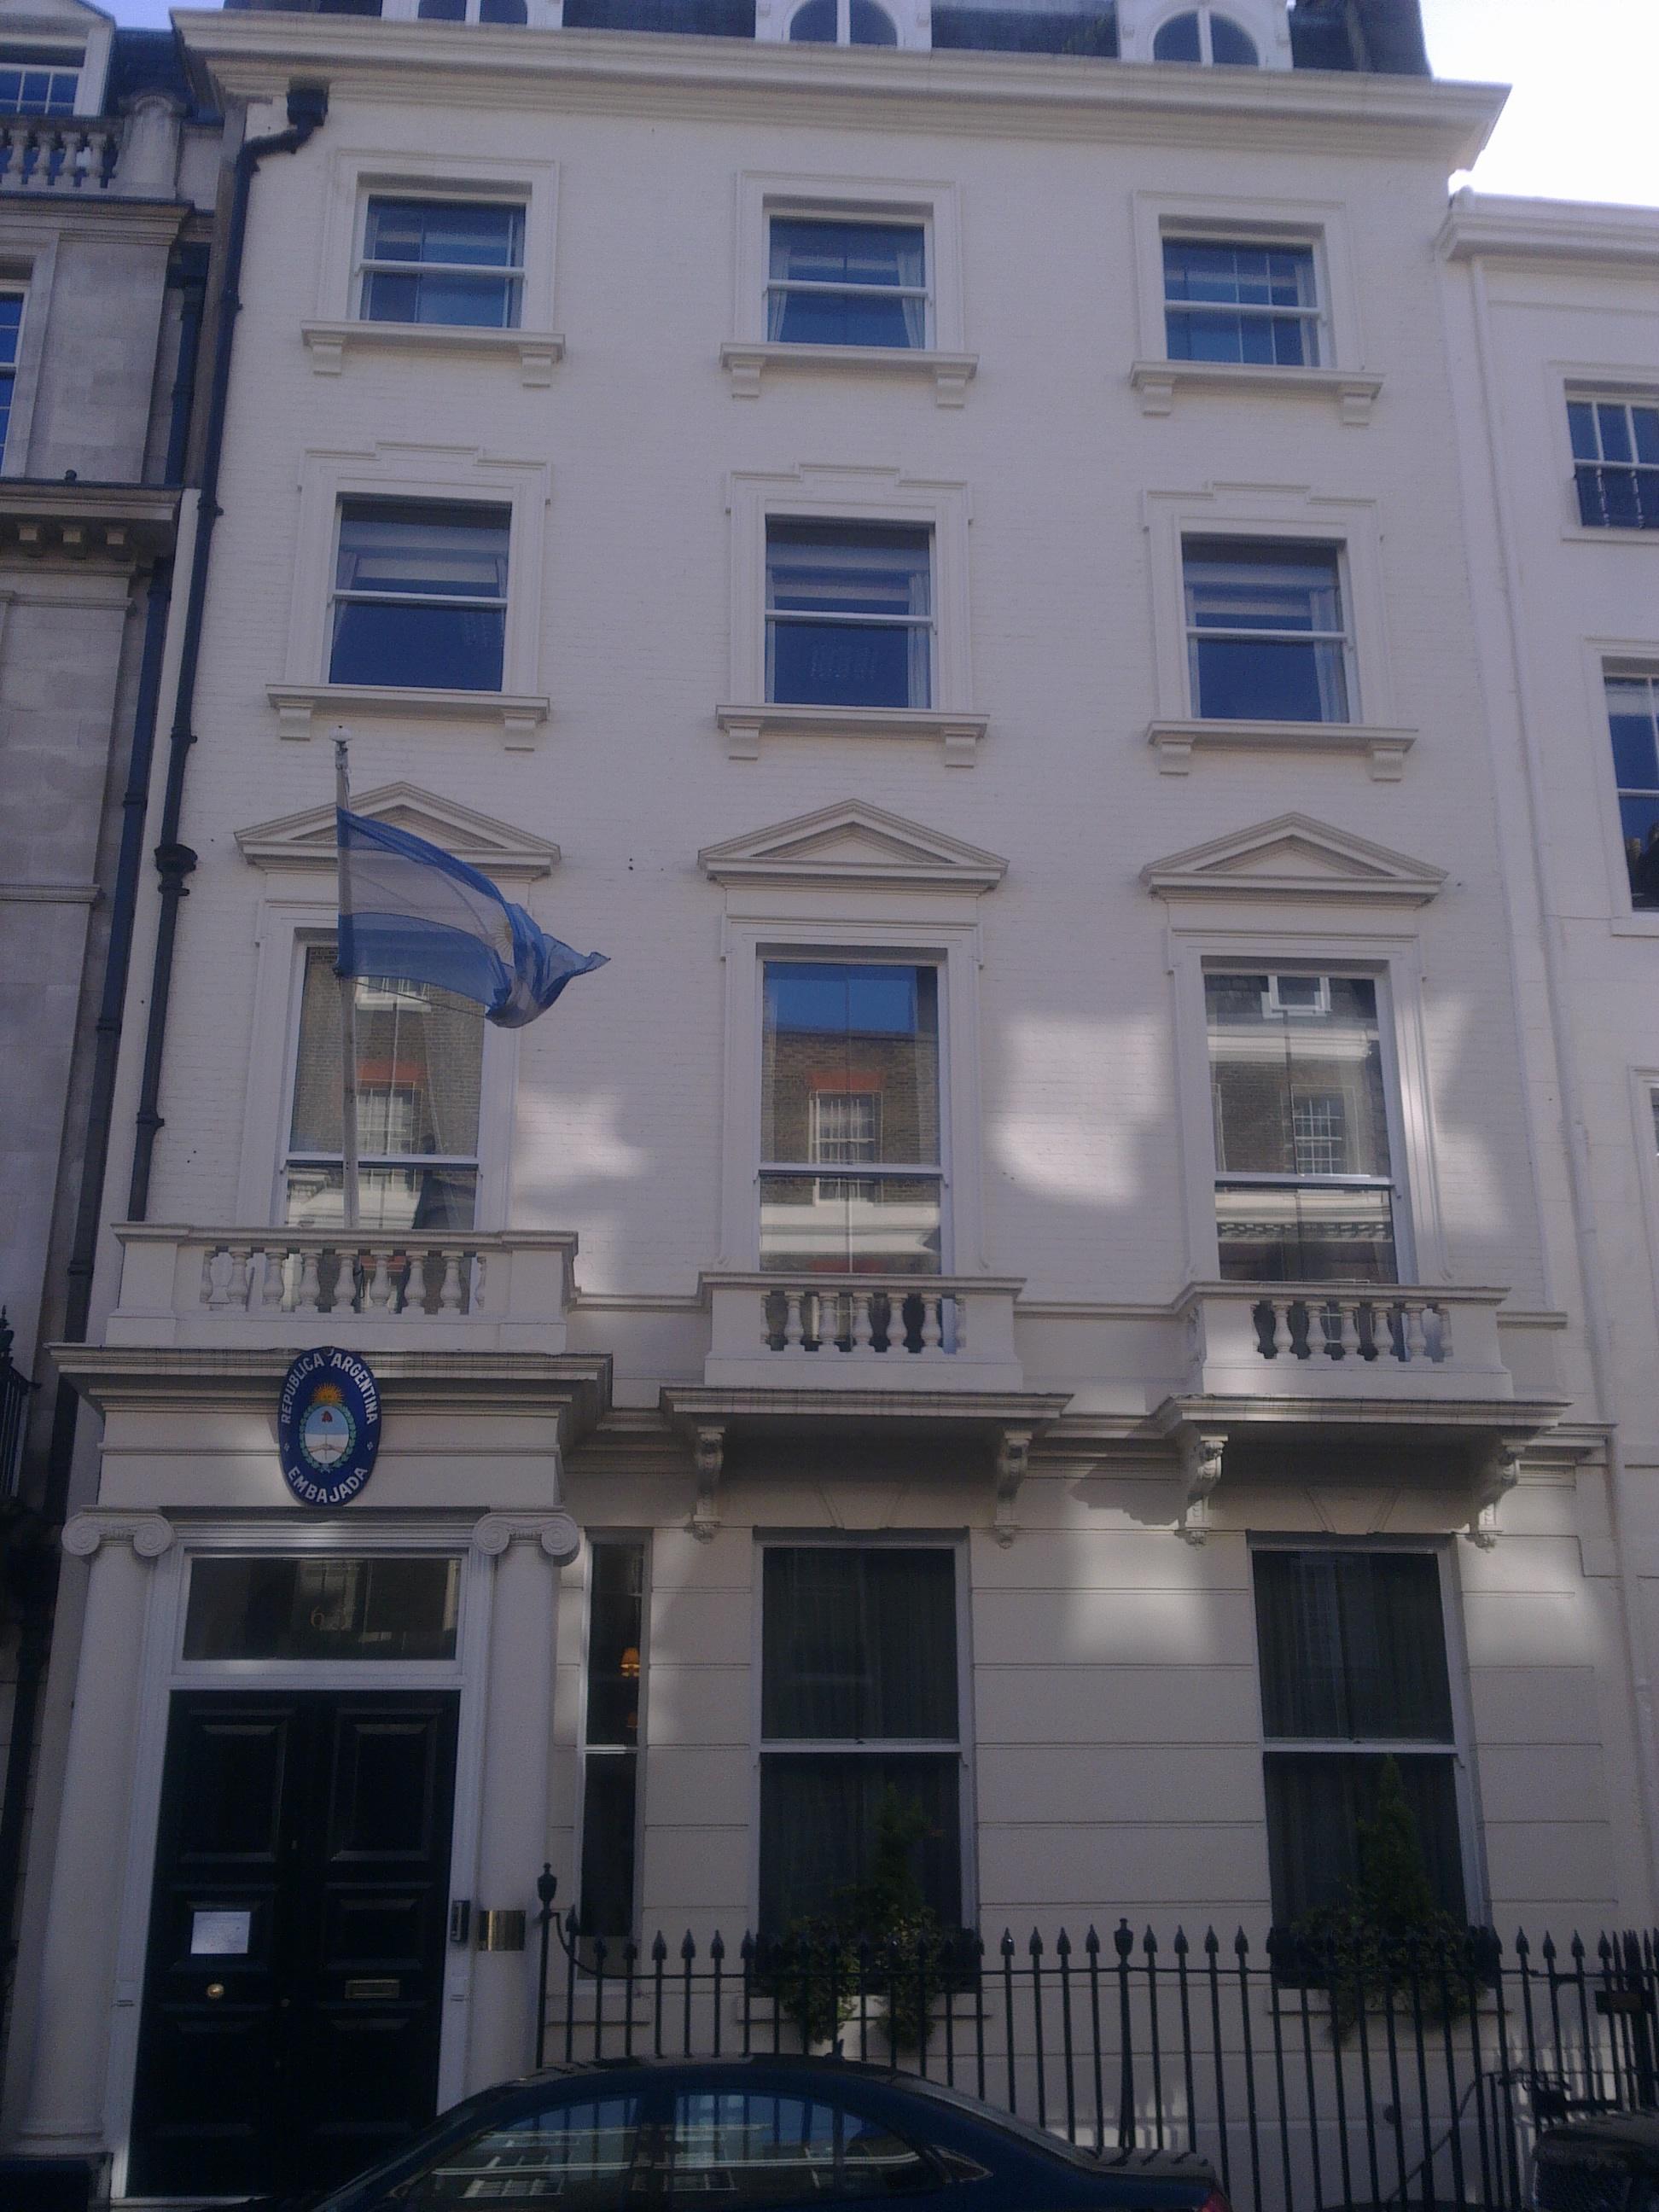 Embassy of Argentina, London - Wikipedia